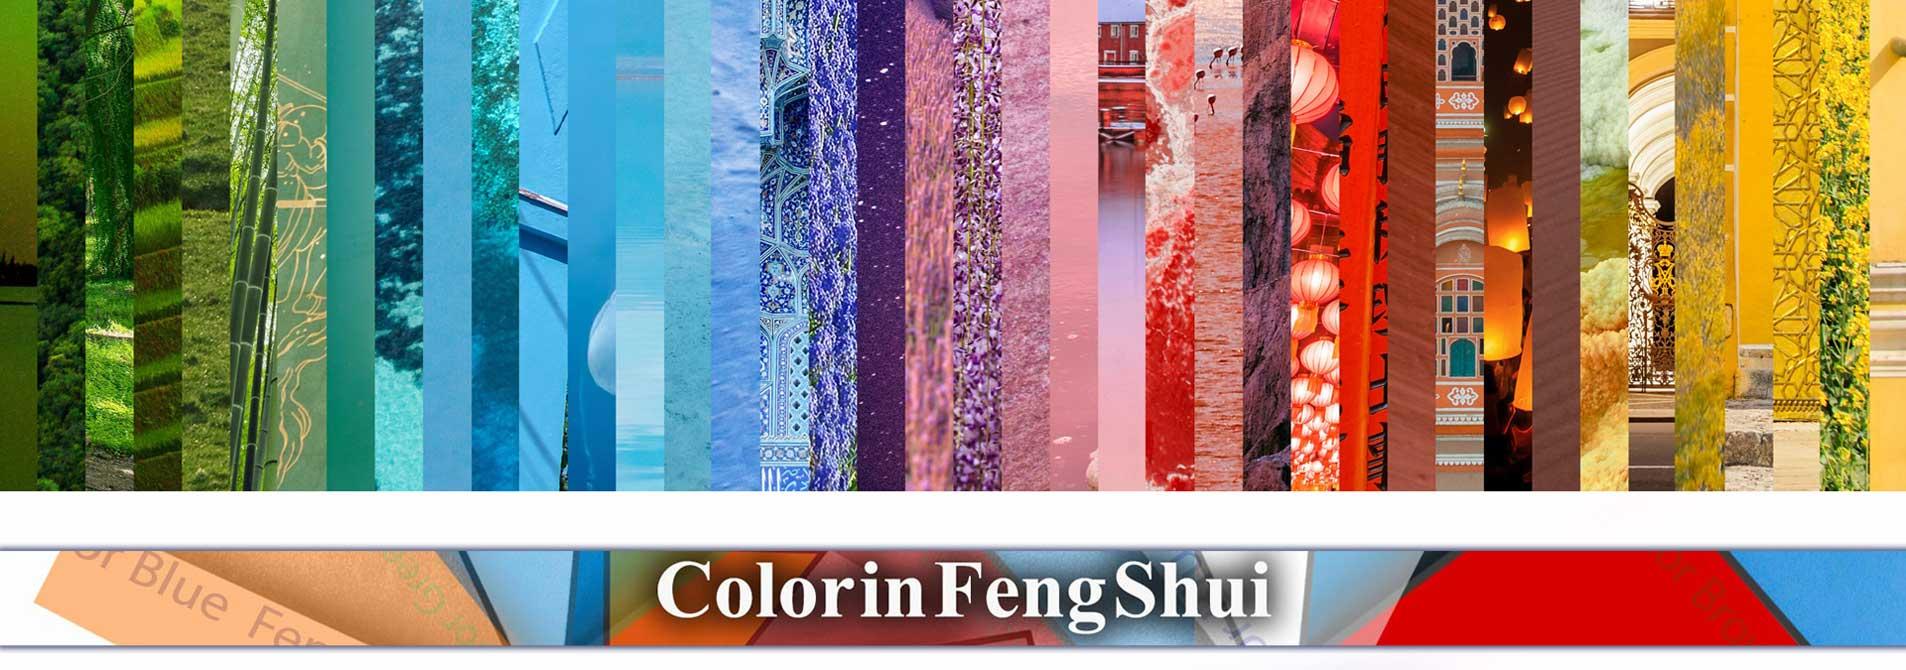 Feng Shui rang 3s 111 - فنگ شویی رنگ ها ، رنگ شناسی فنگ شویی